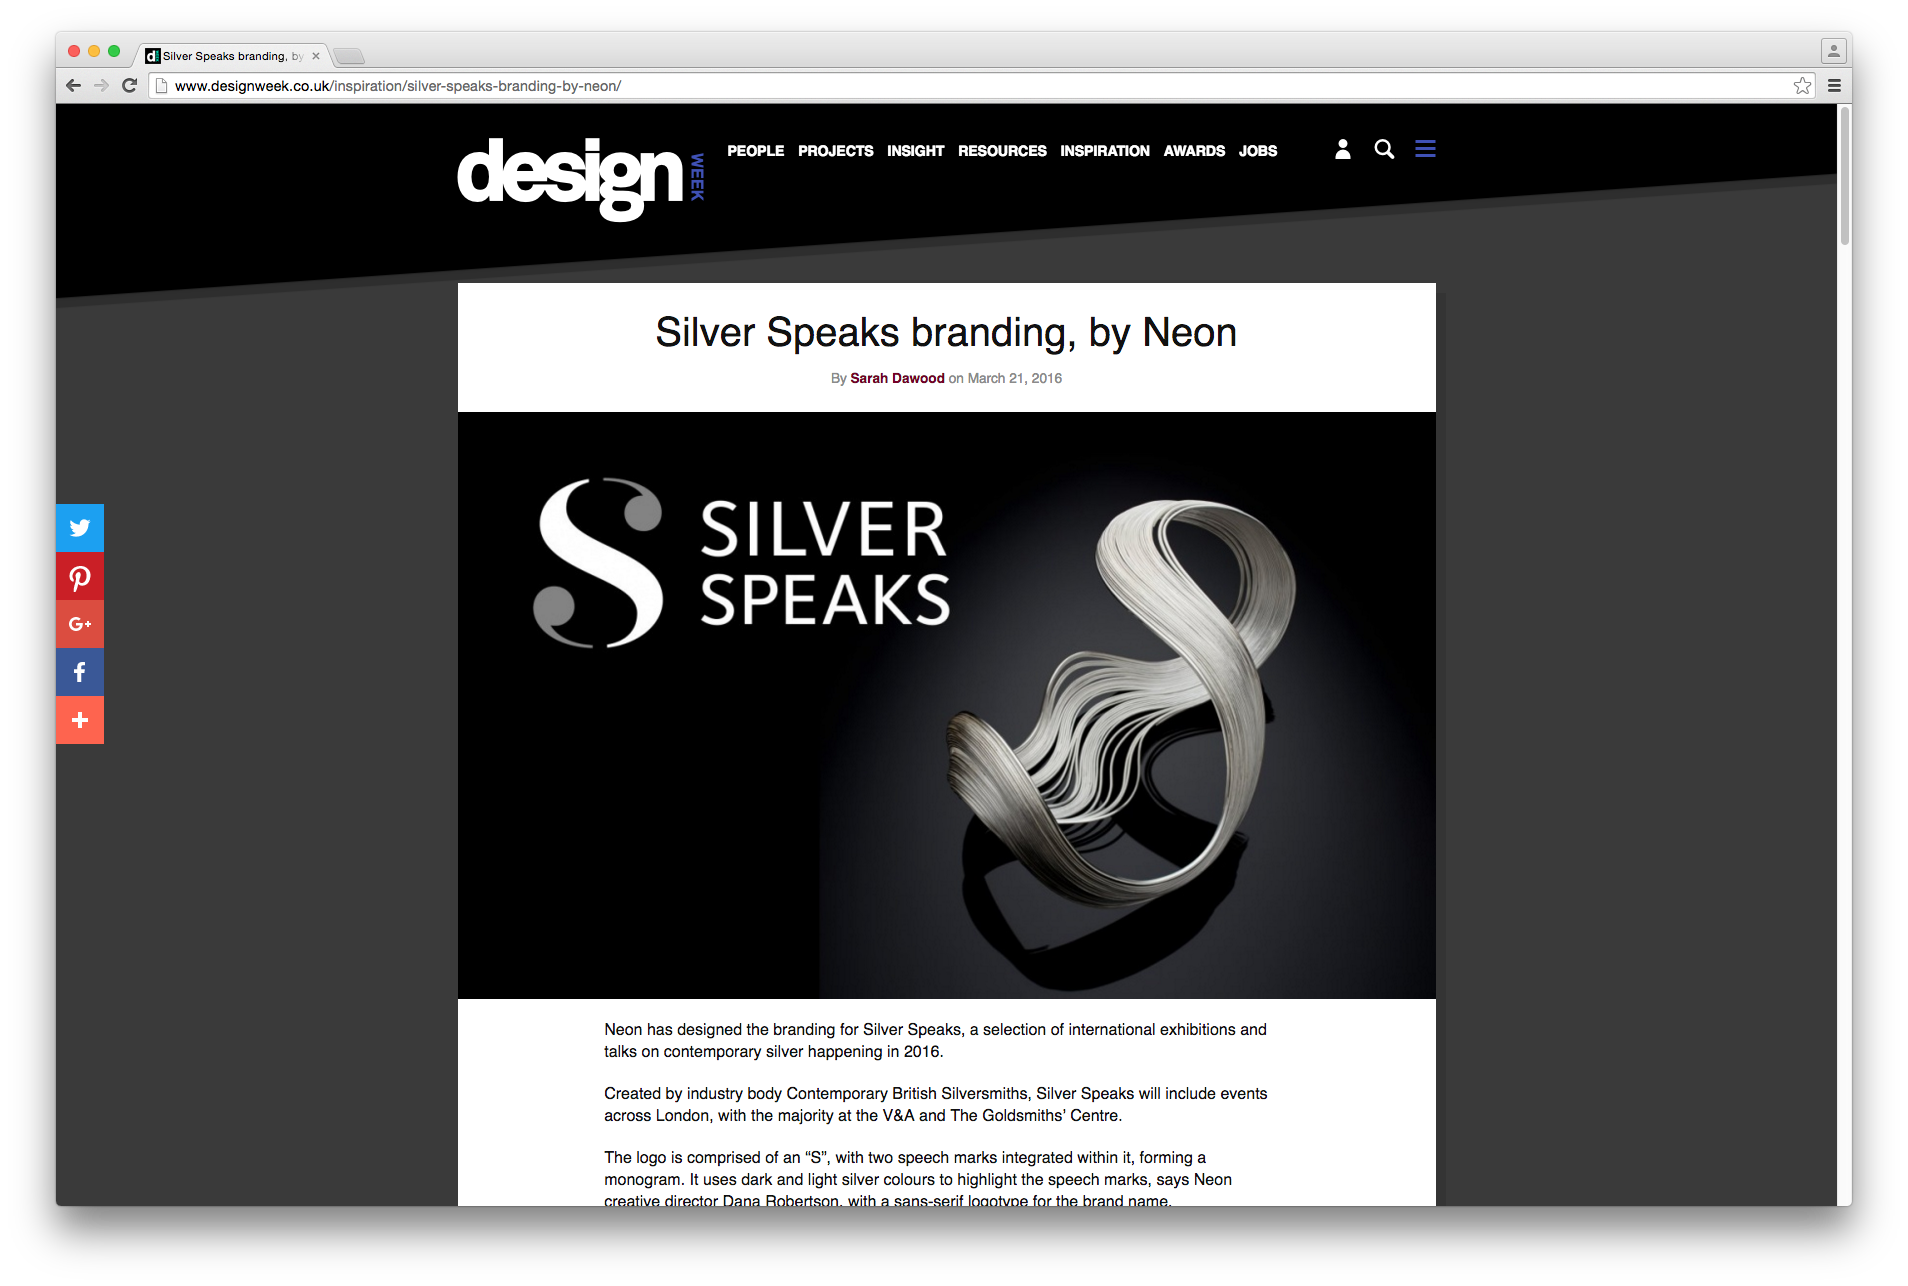 Branding by Neon - designed by Dana Robertson - Silver Speaks exhibition - features in Design Week magazine